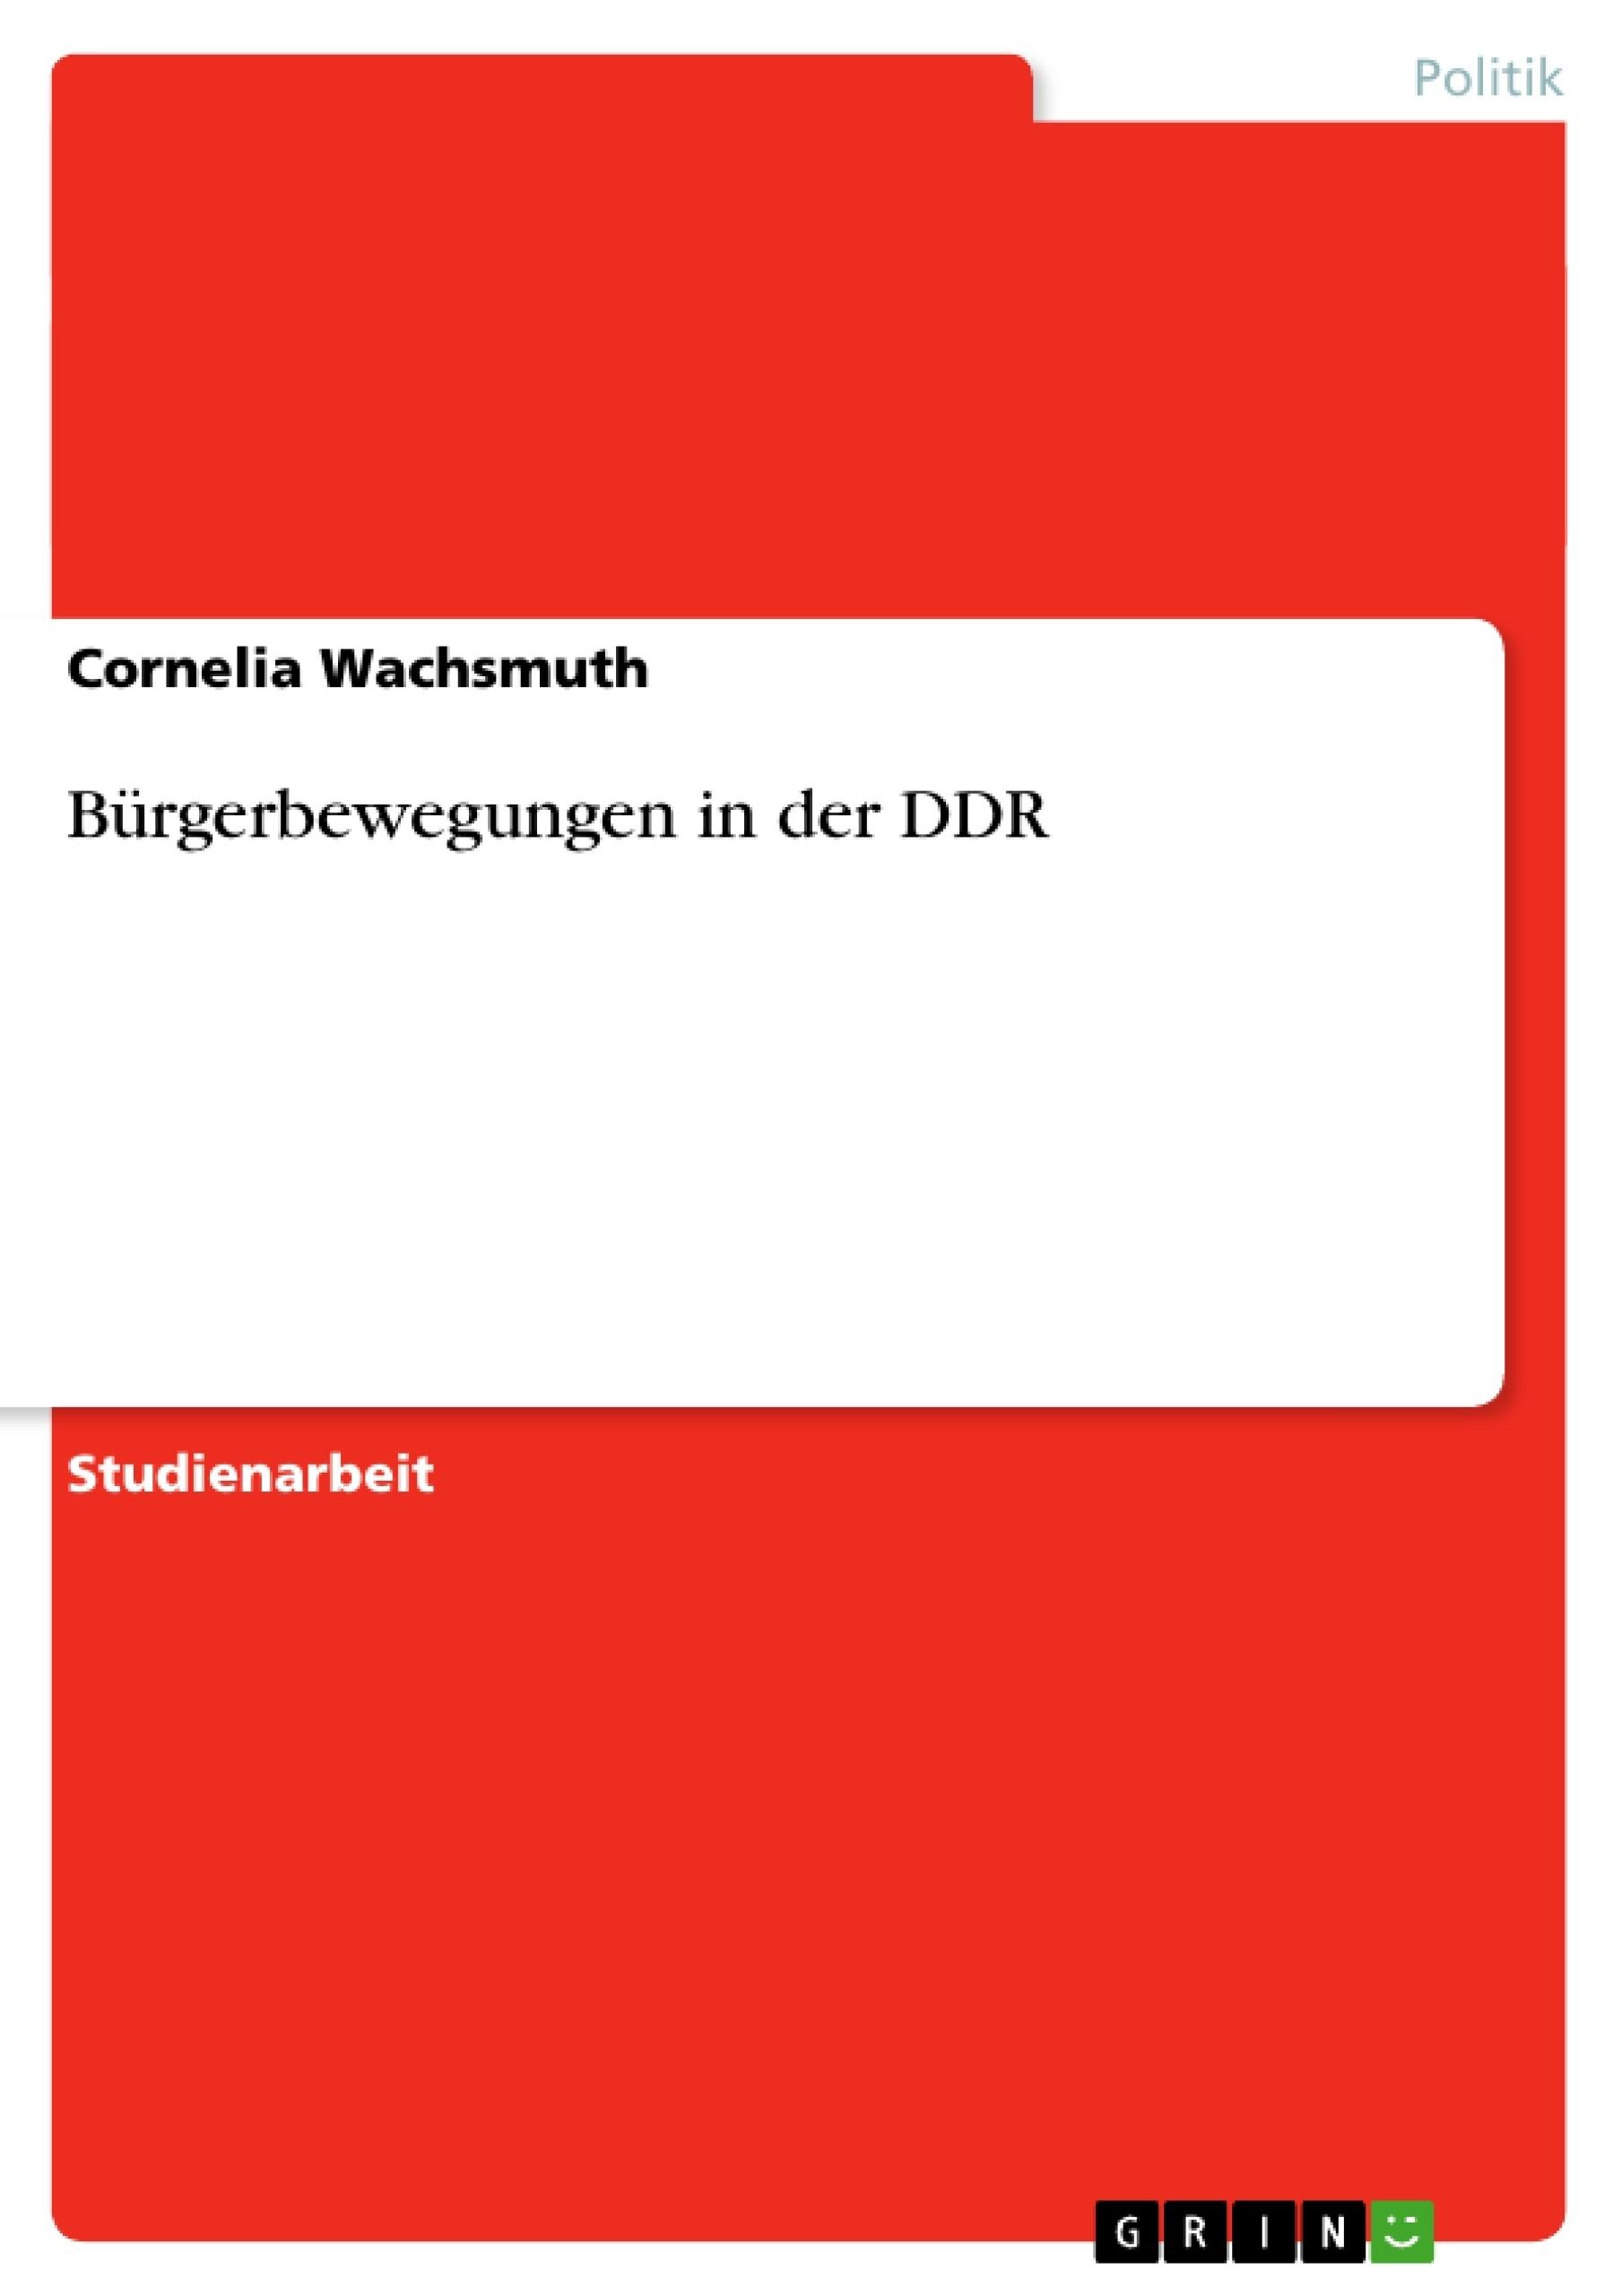 Titel: Bürgerbewegungen in der DDR